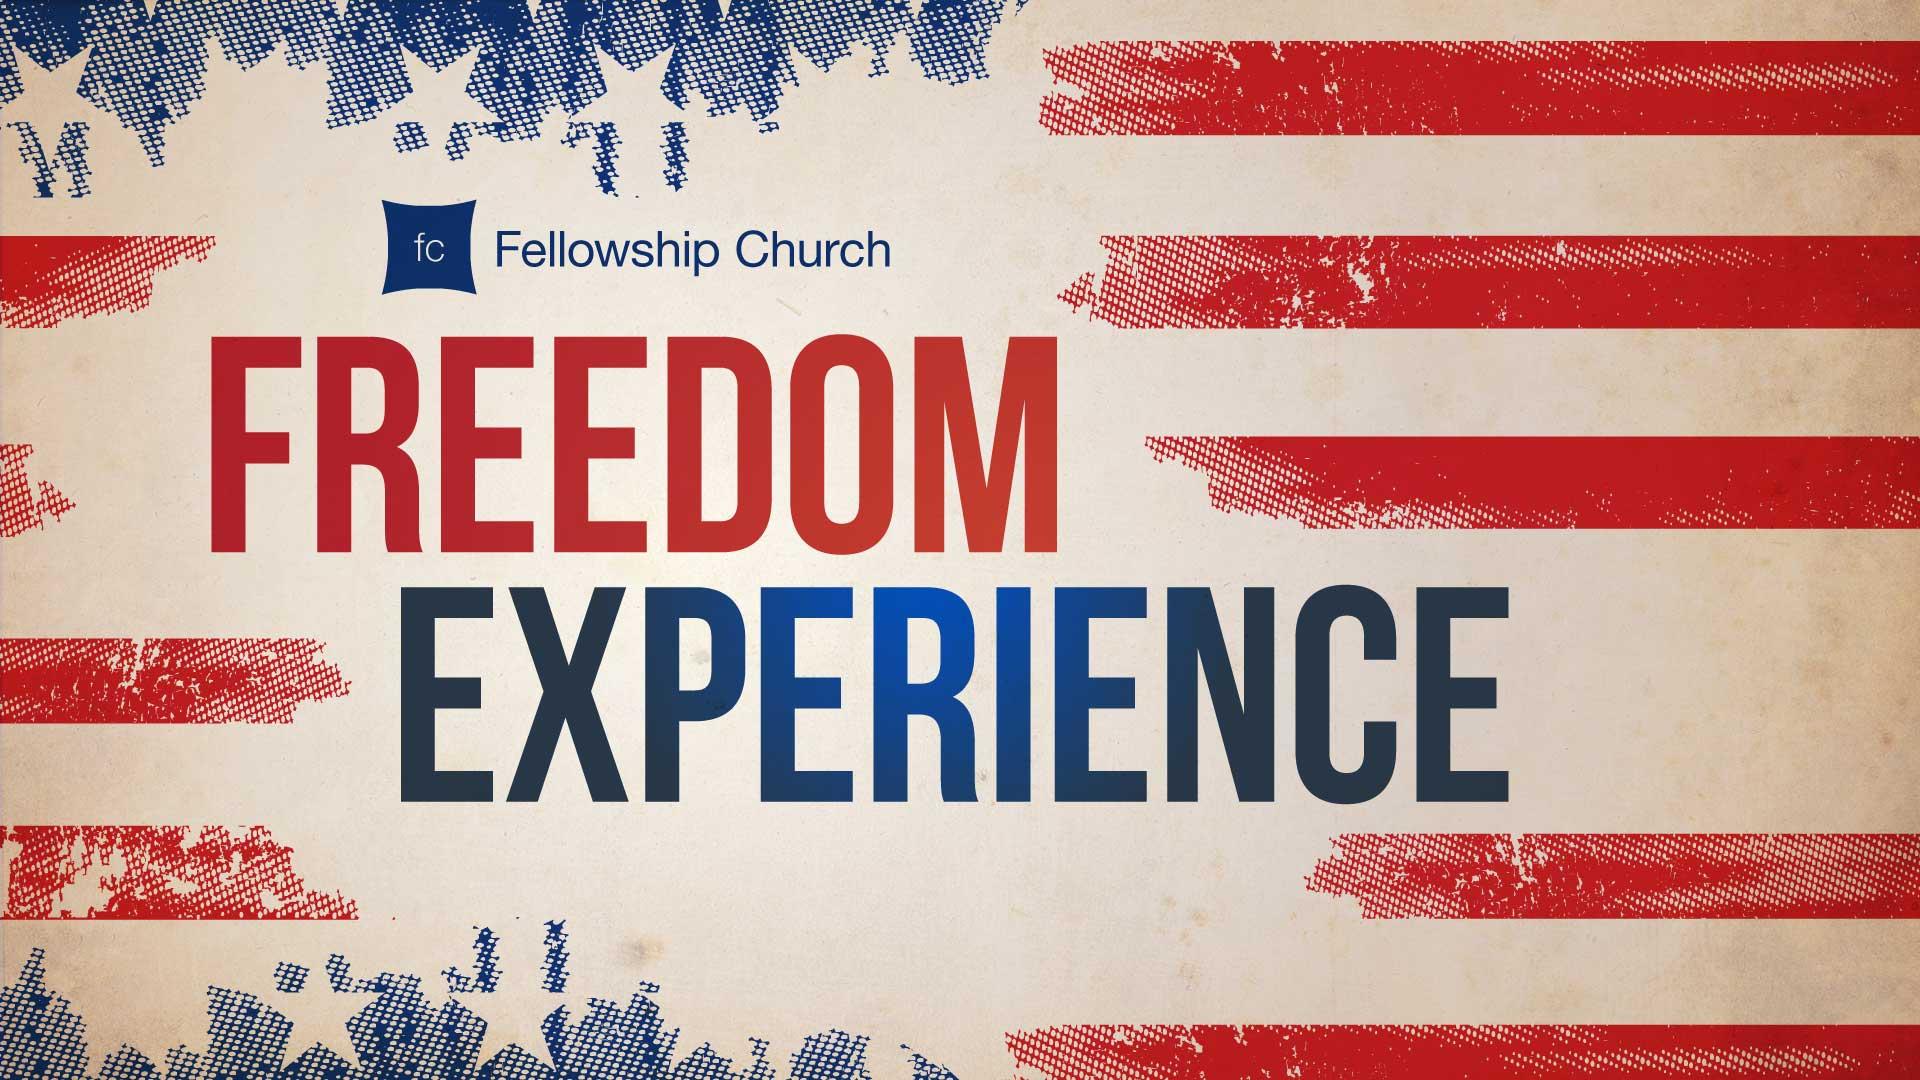 Freedom Experience 2015